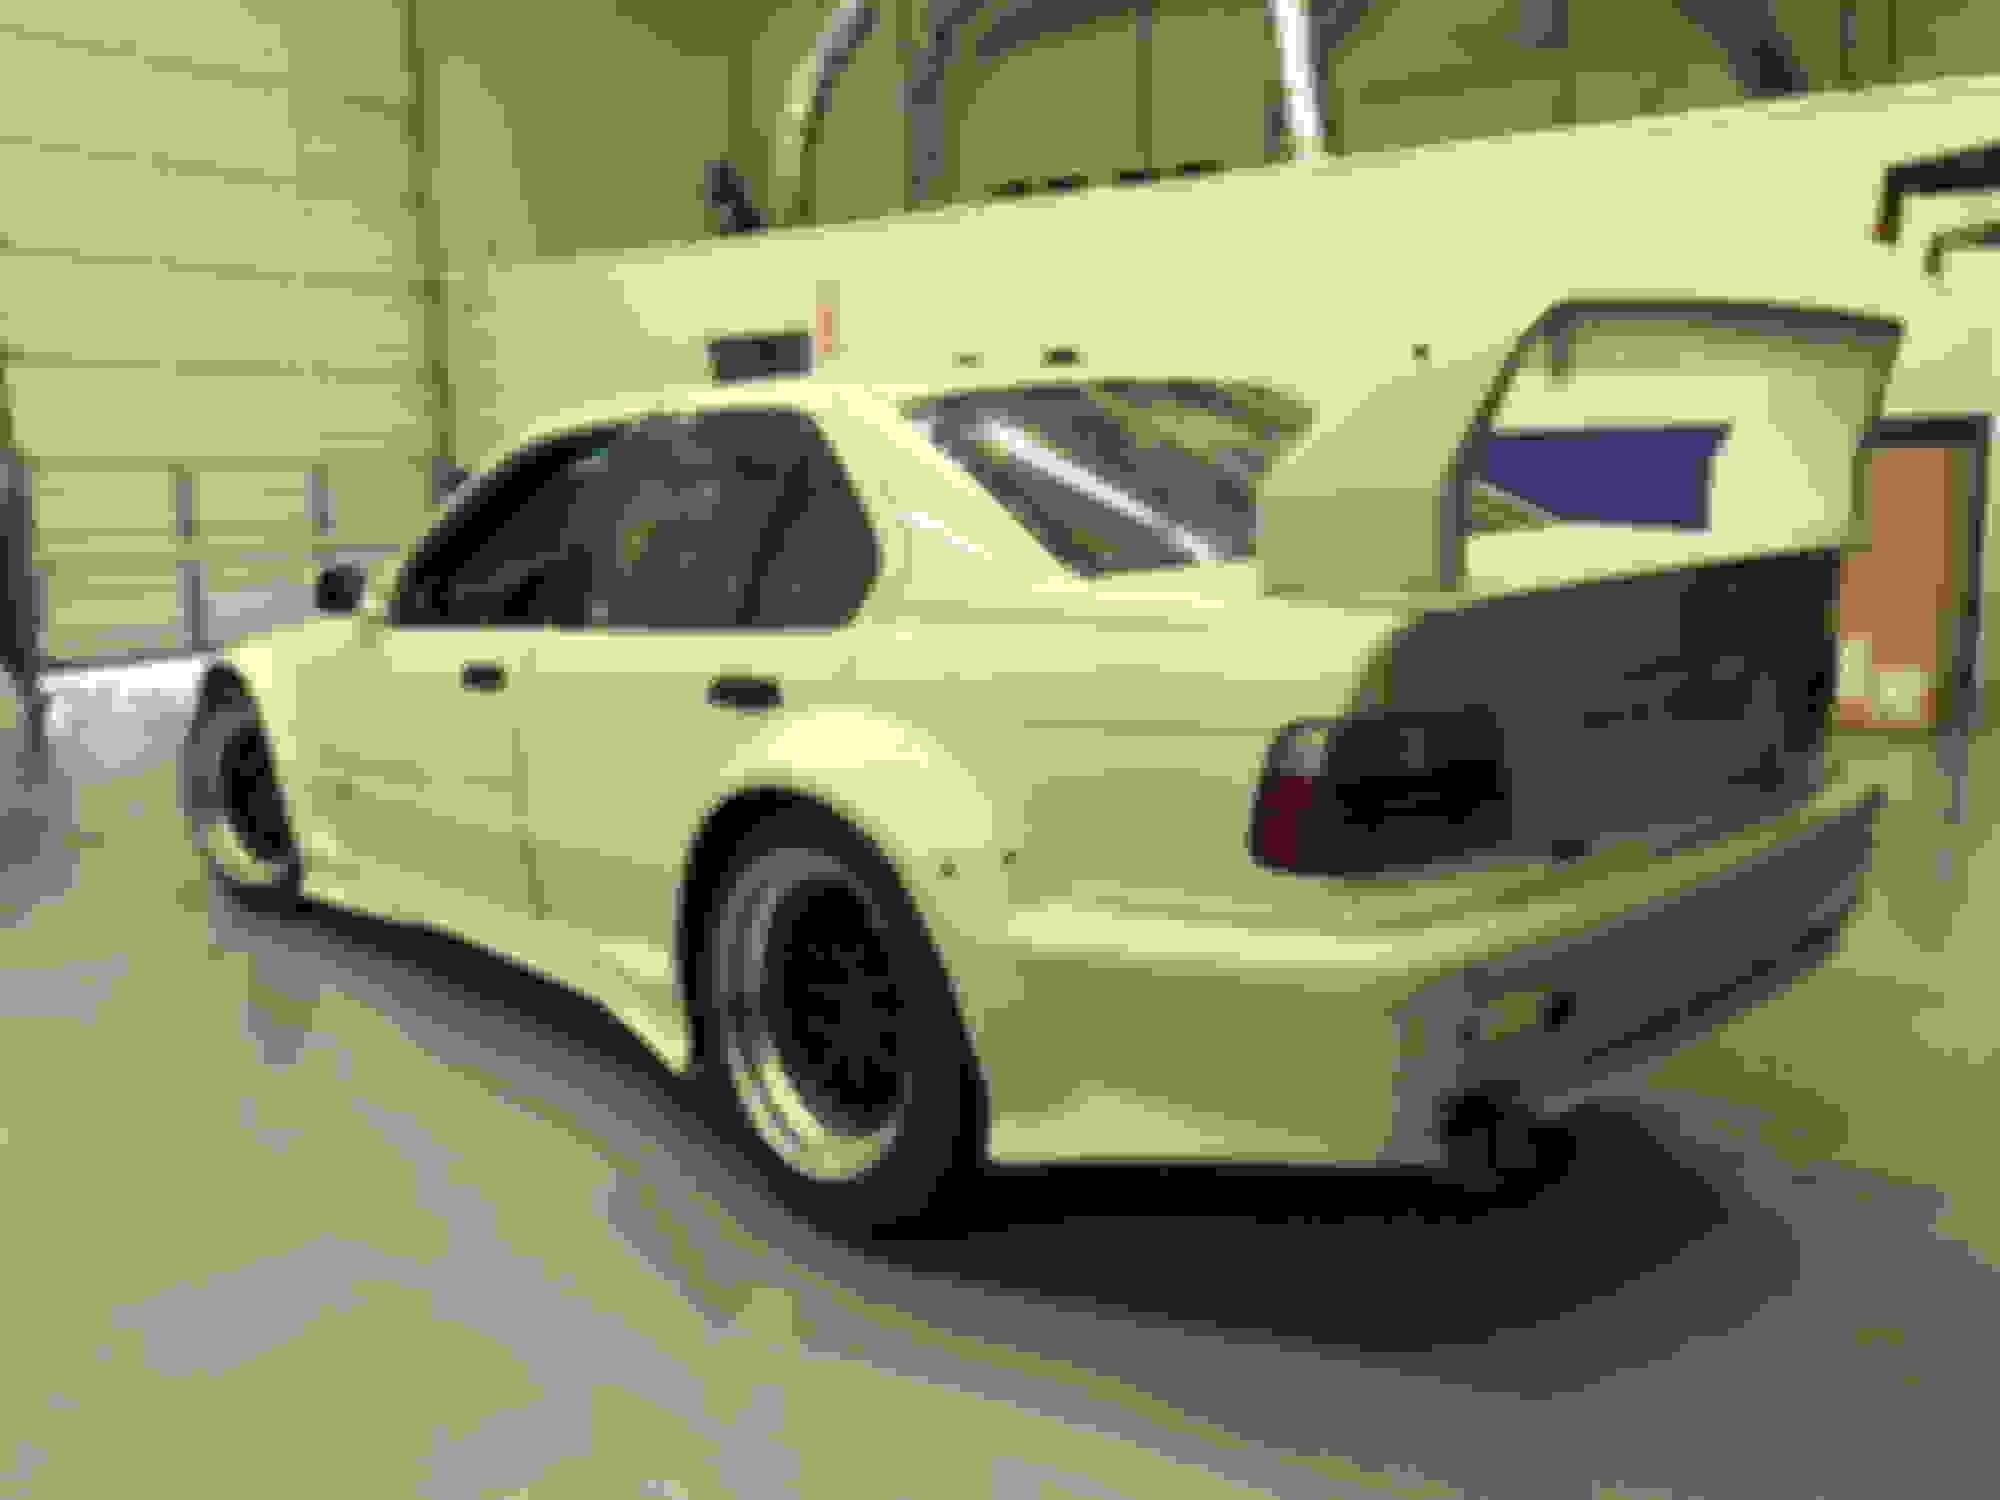 BMW E36 M3 S54 PTG wide 4 door Race Car - Rennlist ... Bmw E Race Car Wiring on bmw e36 with small tires, bmw street car custom, bmw e36 racing, bmw imsa, bmw e36 wheels,